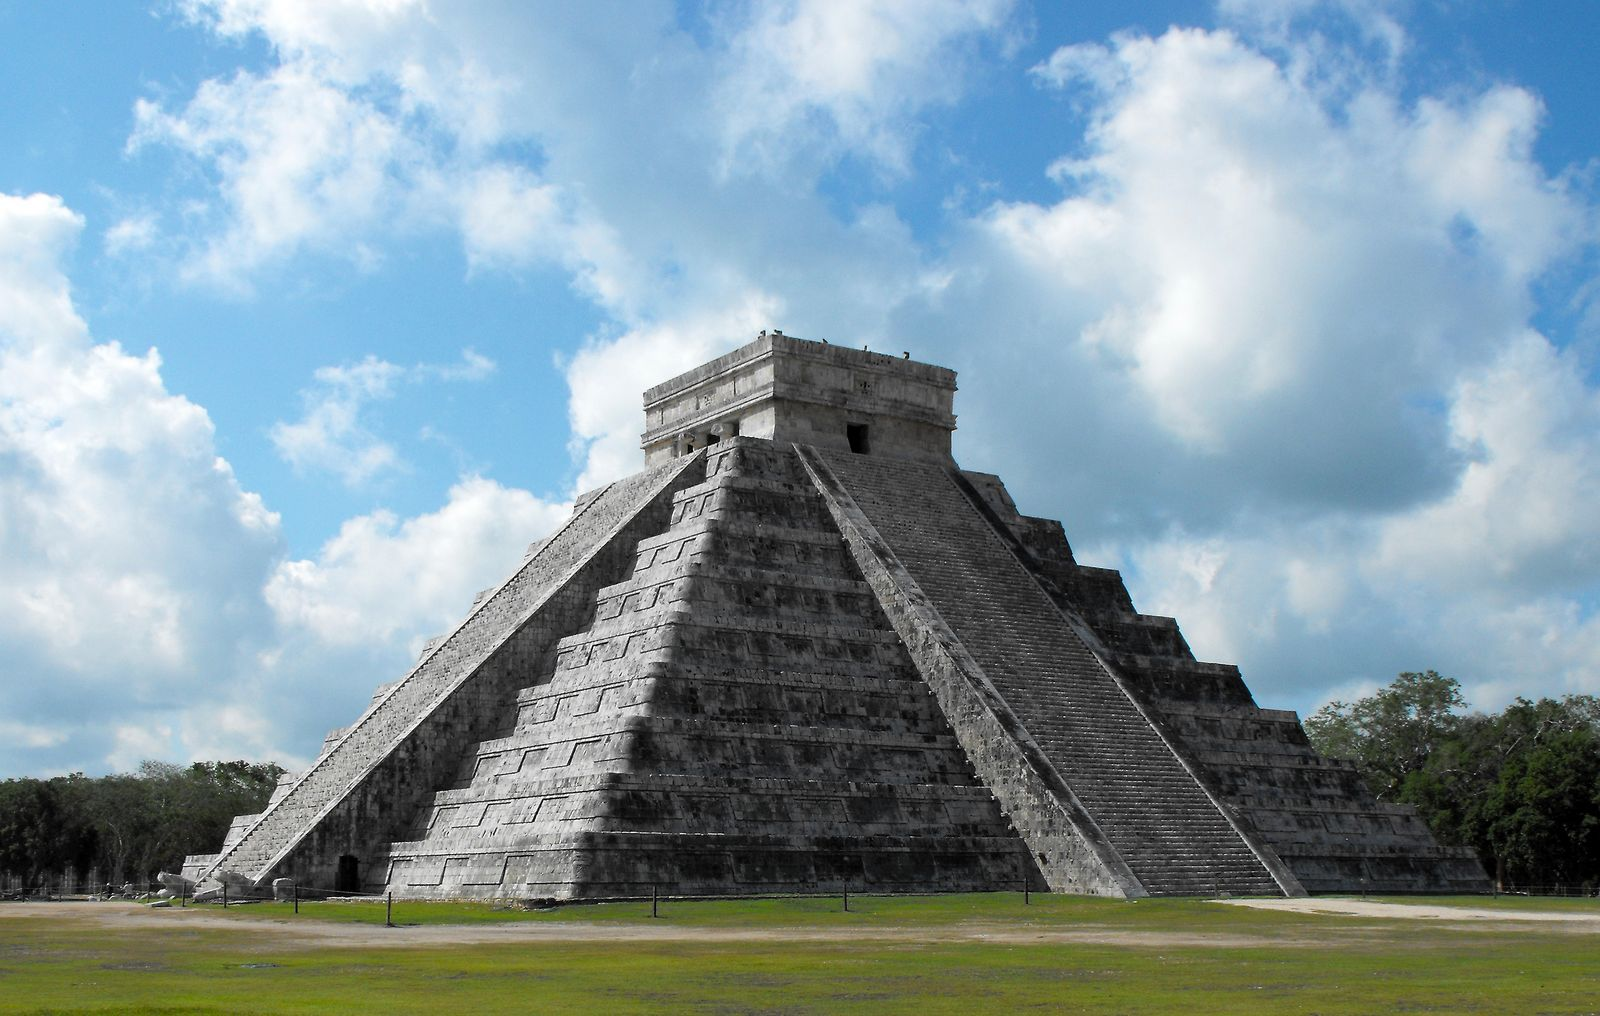 Chichén Itzá Quintana Roo Mexico Mayan Ruins Photographs by Bill Bell